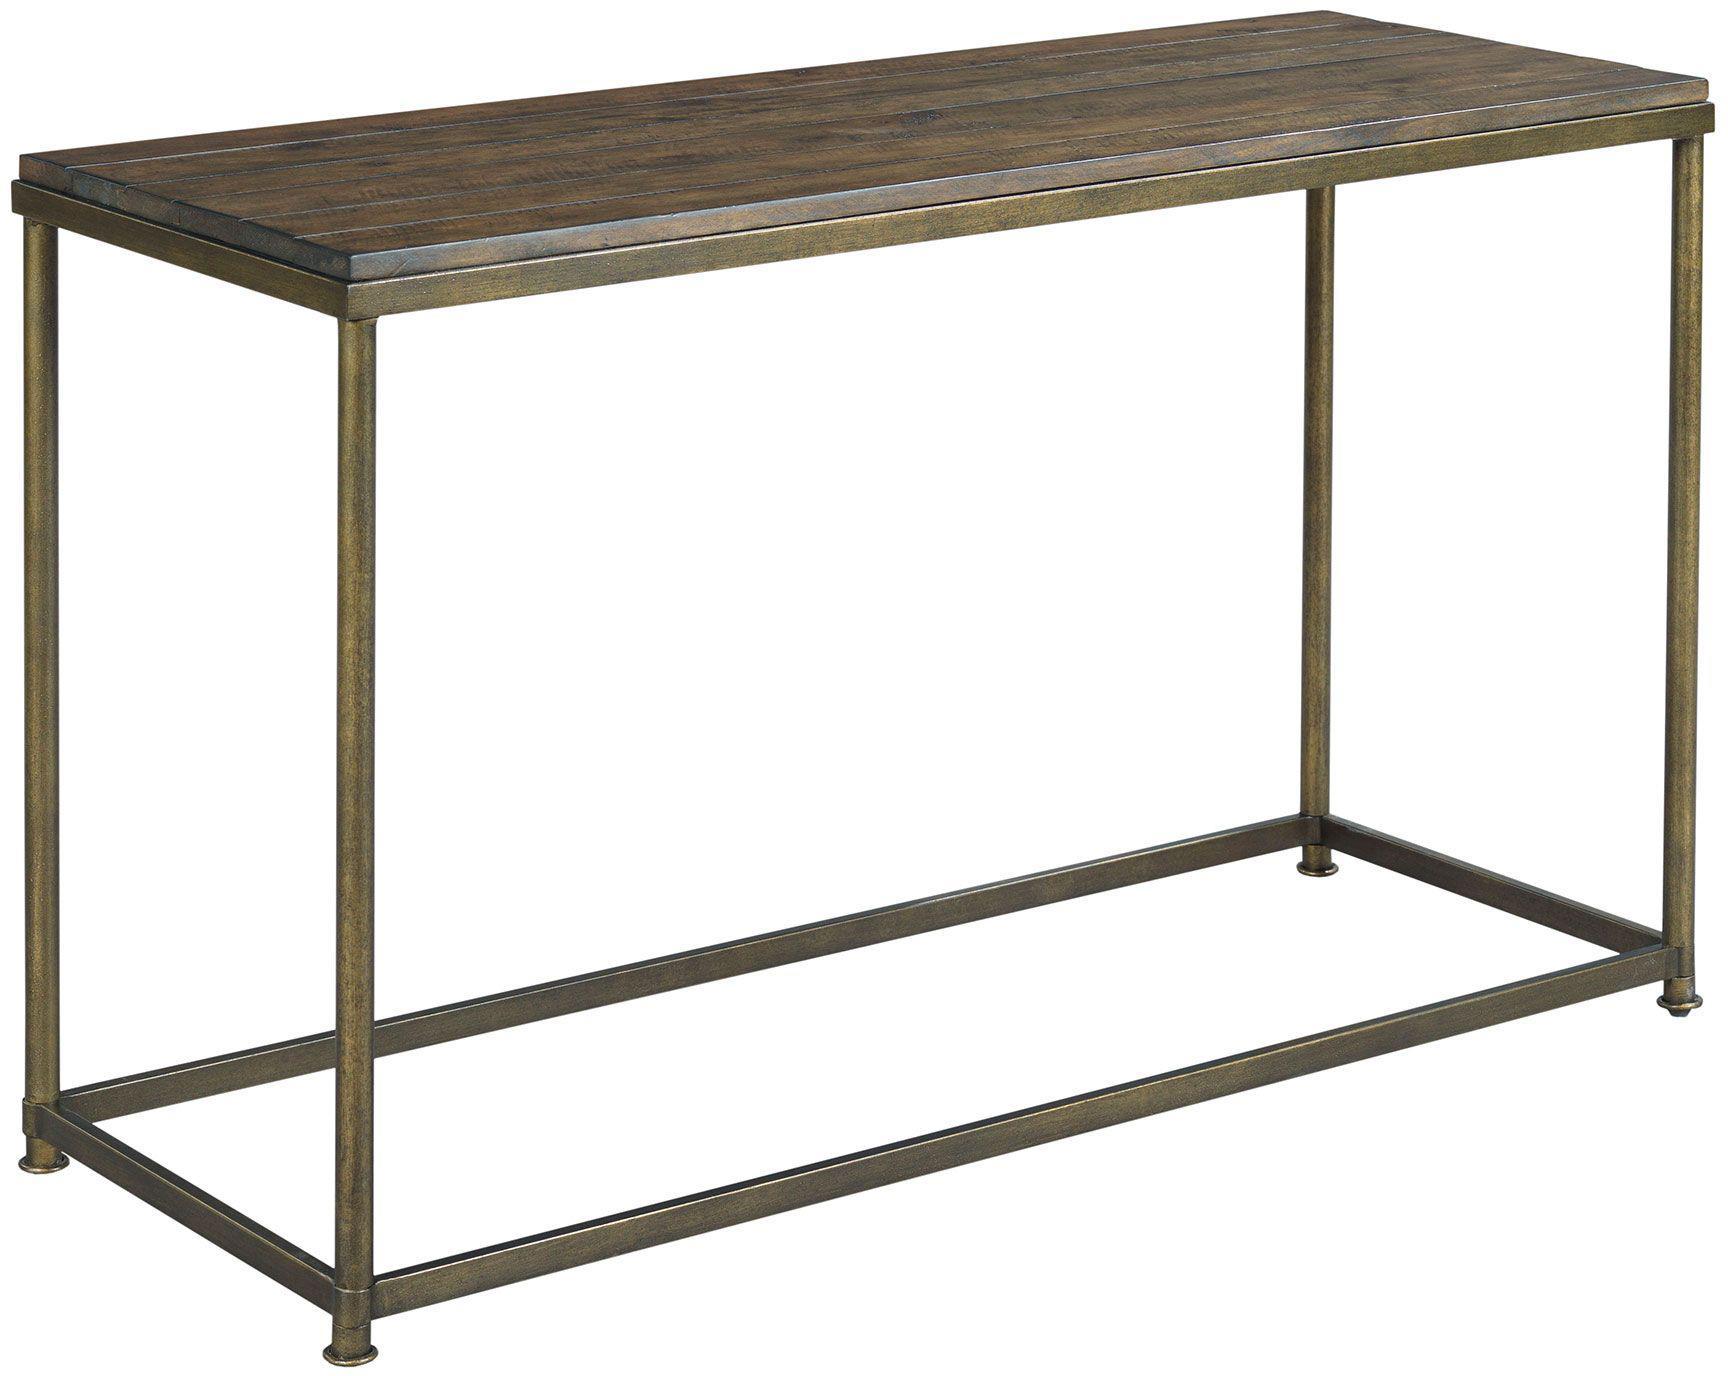 Hammary Leone Sofa Table - Item Number: 563-925